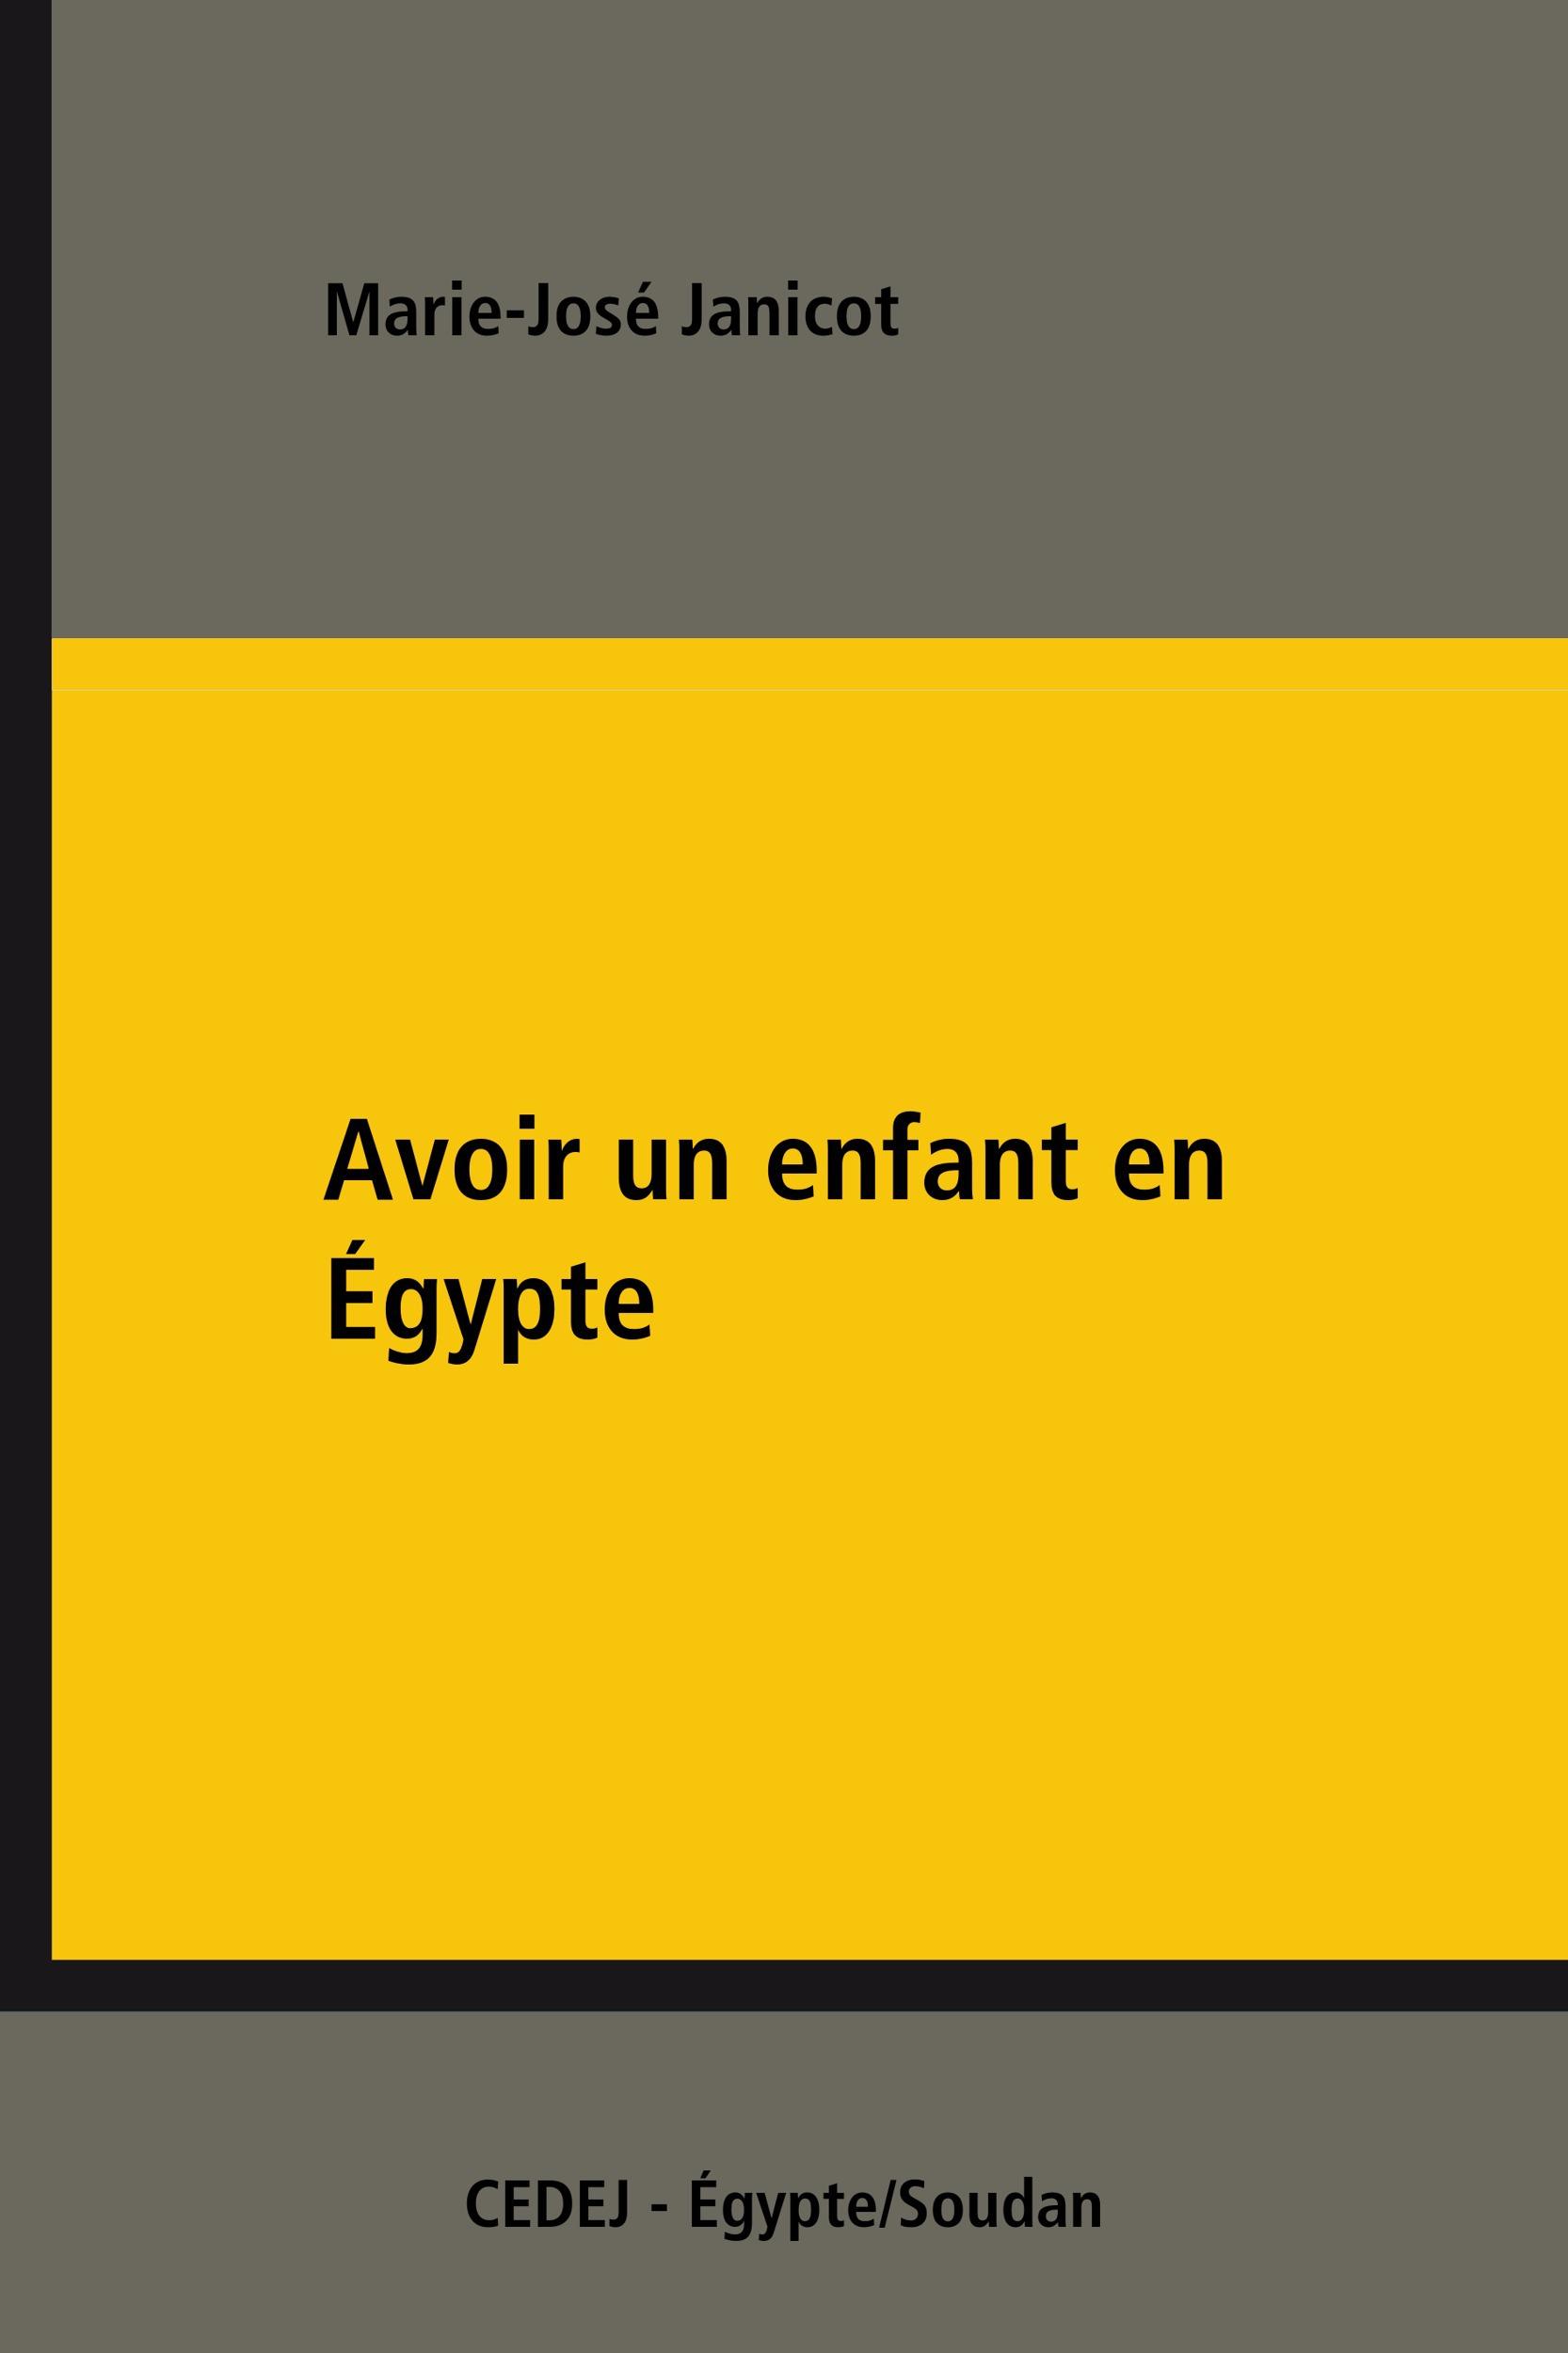 Avoir un enfant en Égypte